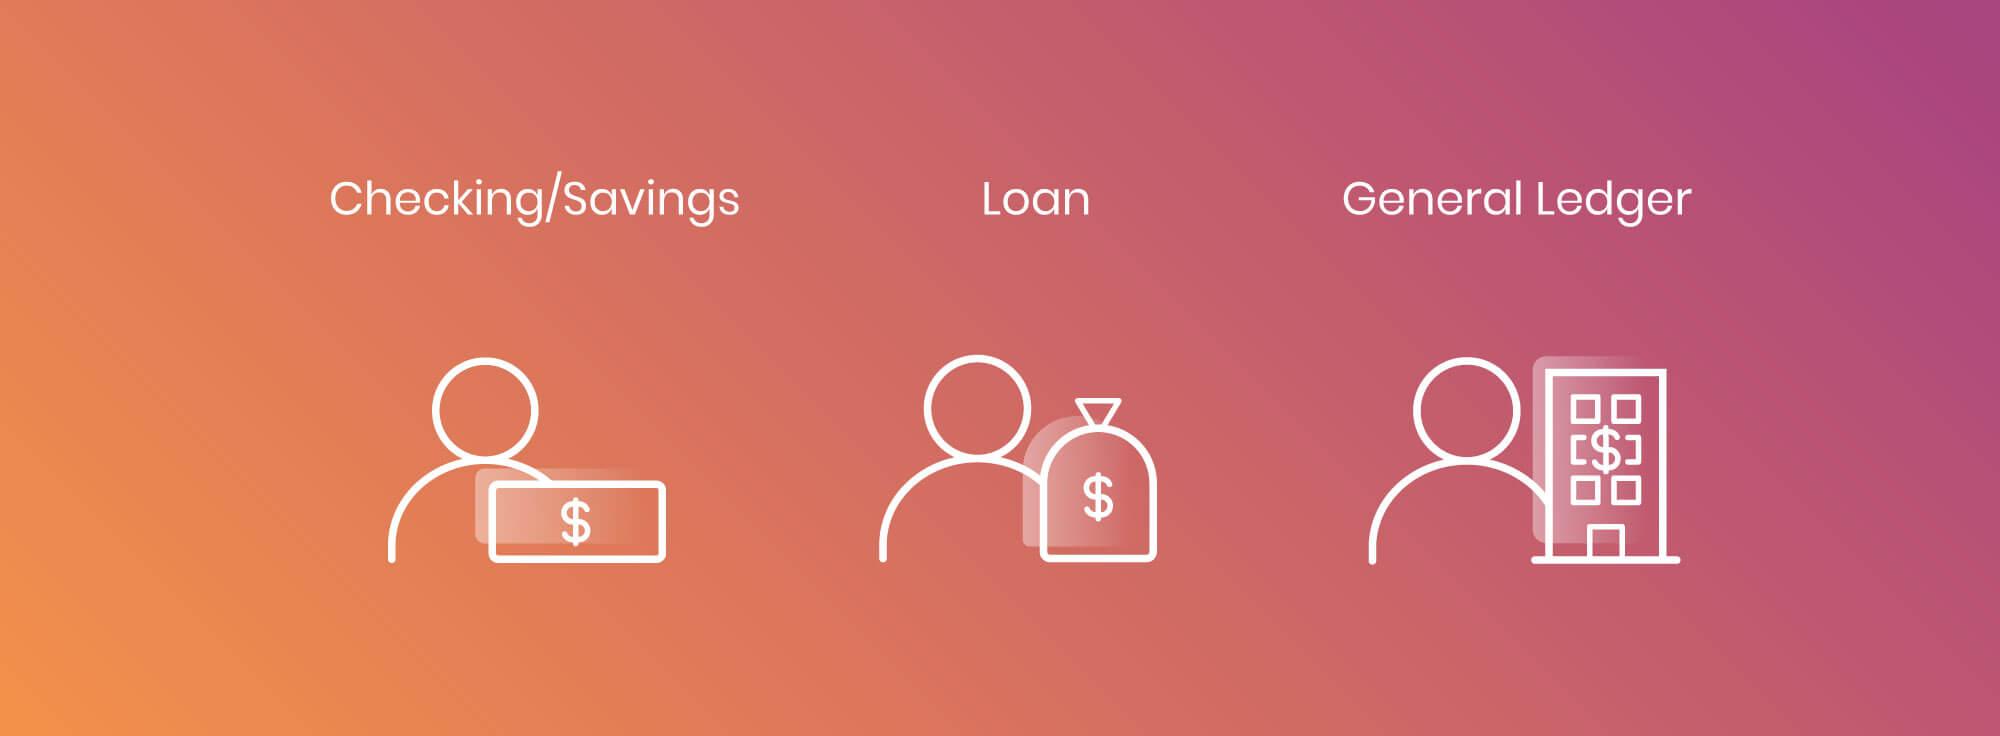 bank account types blog image